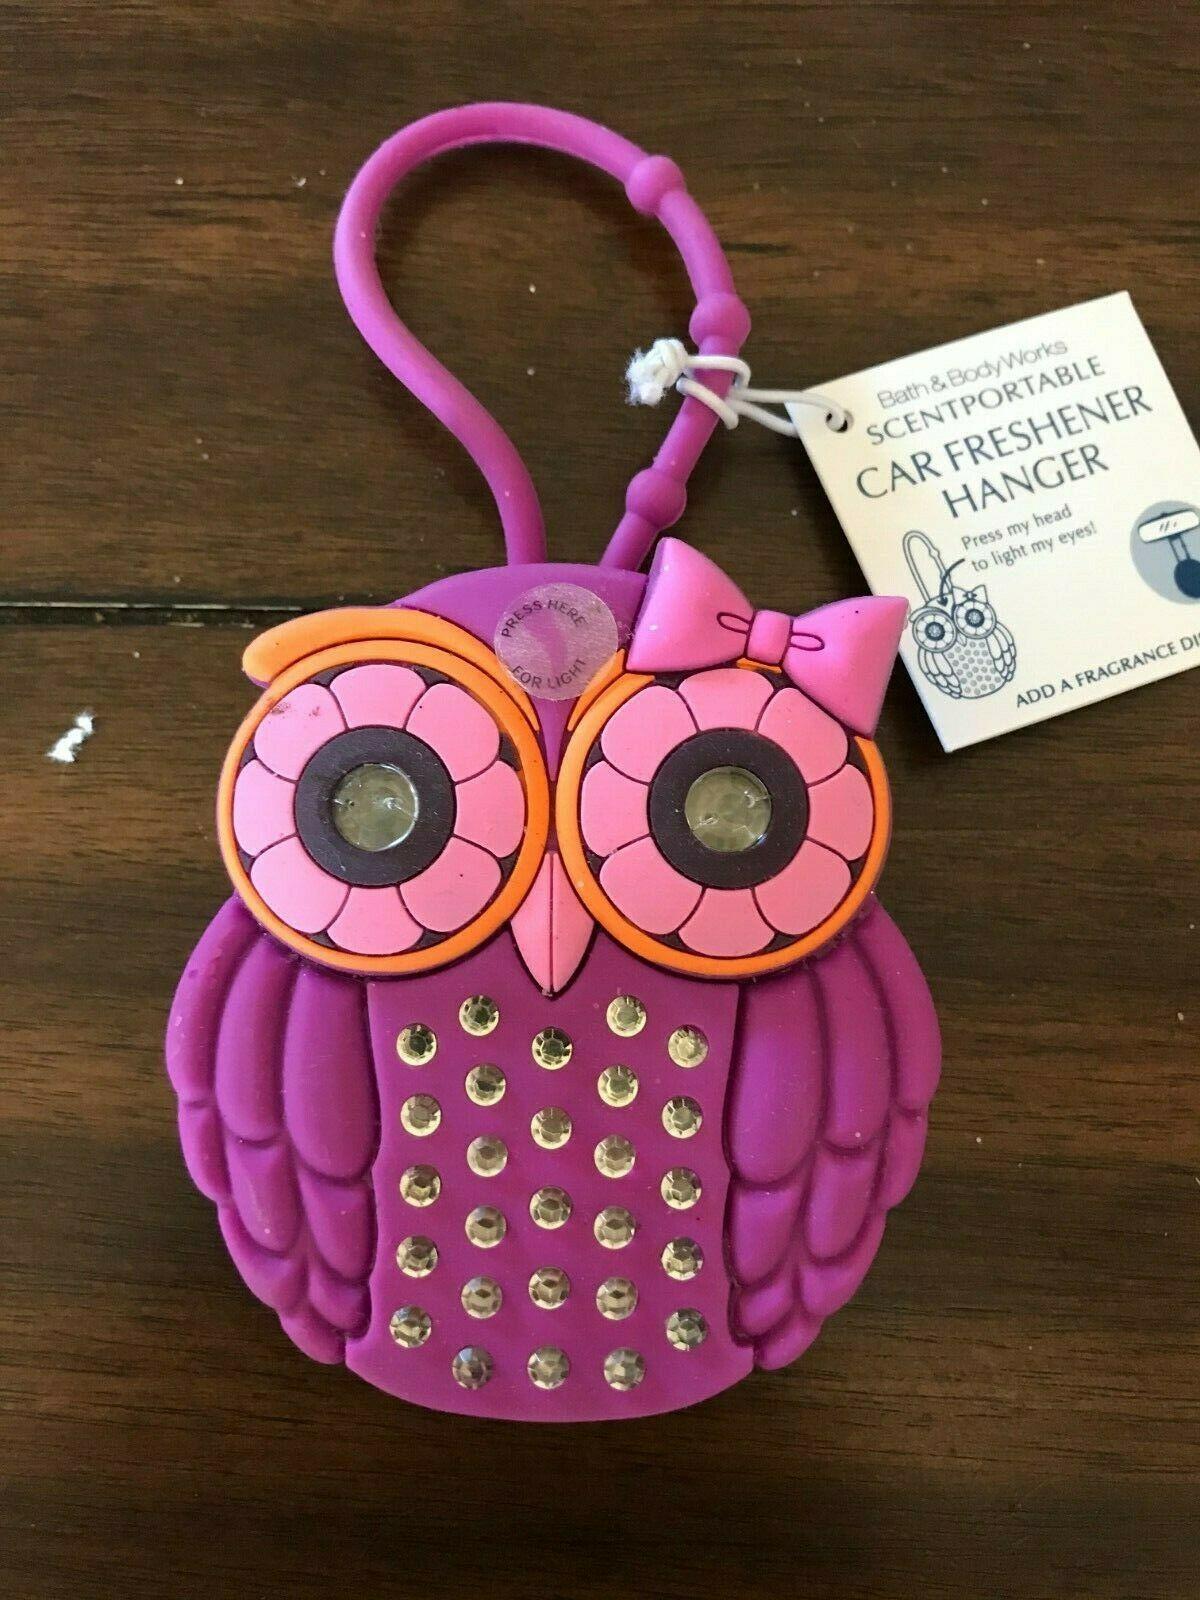 Bath & Body Works Scentportable Car Freshener Hanger Pink Owl with Light up Eyes - $30.00